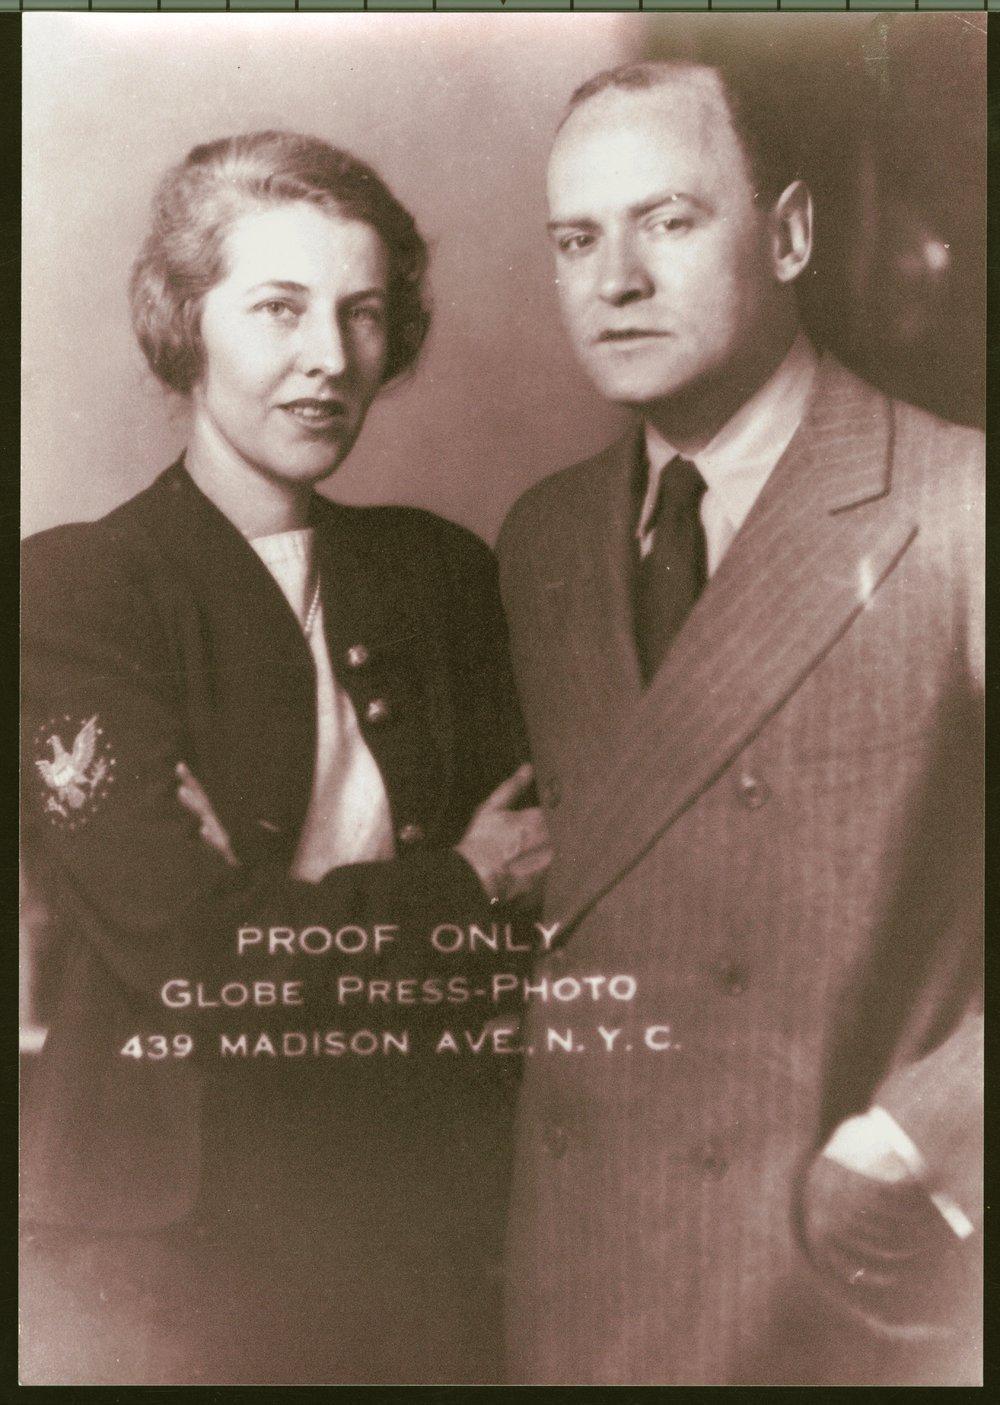 William Lindsay and Kathrine White